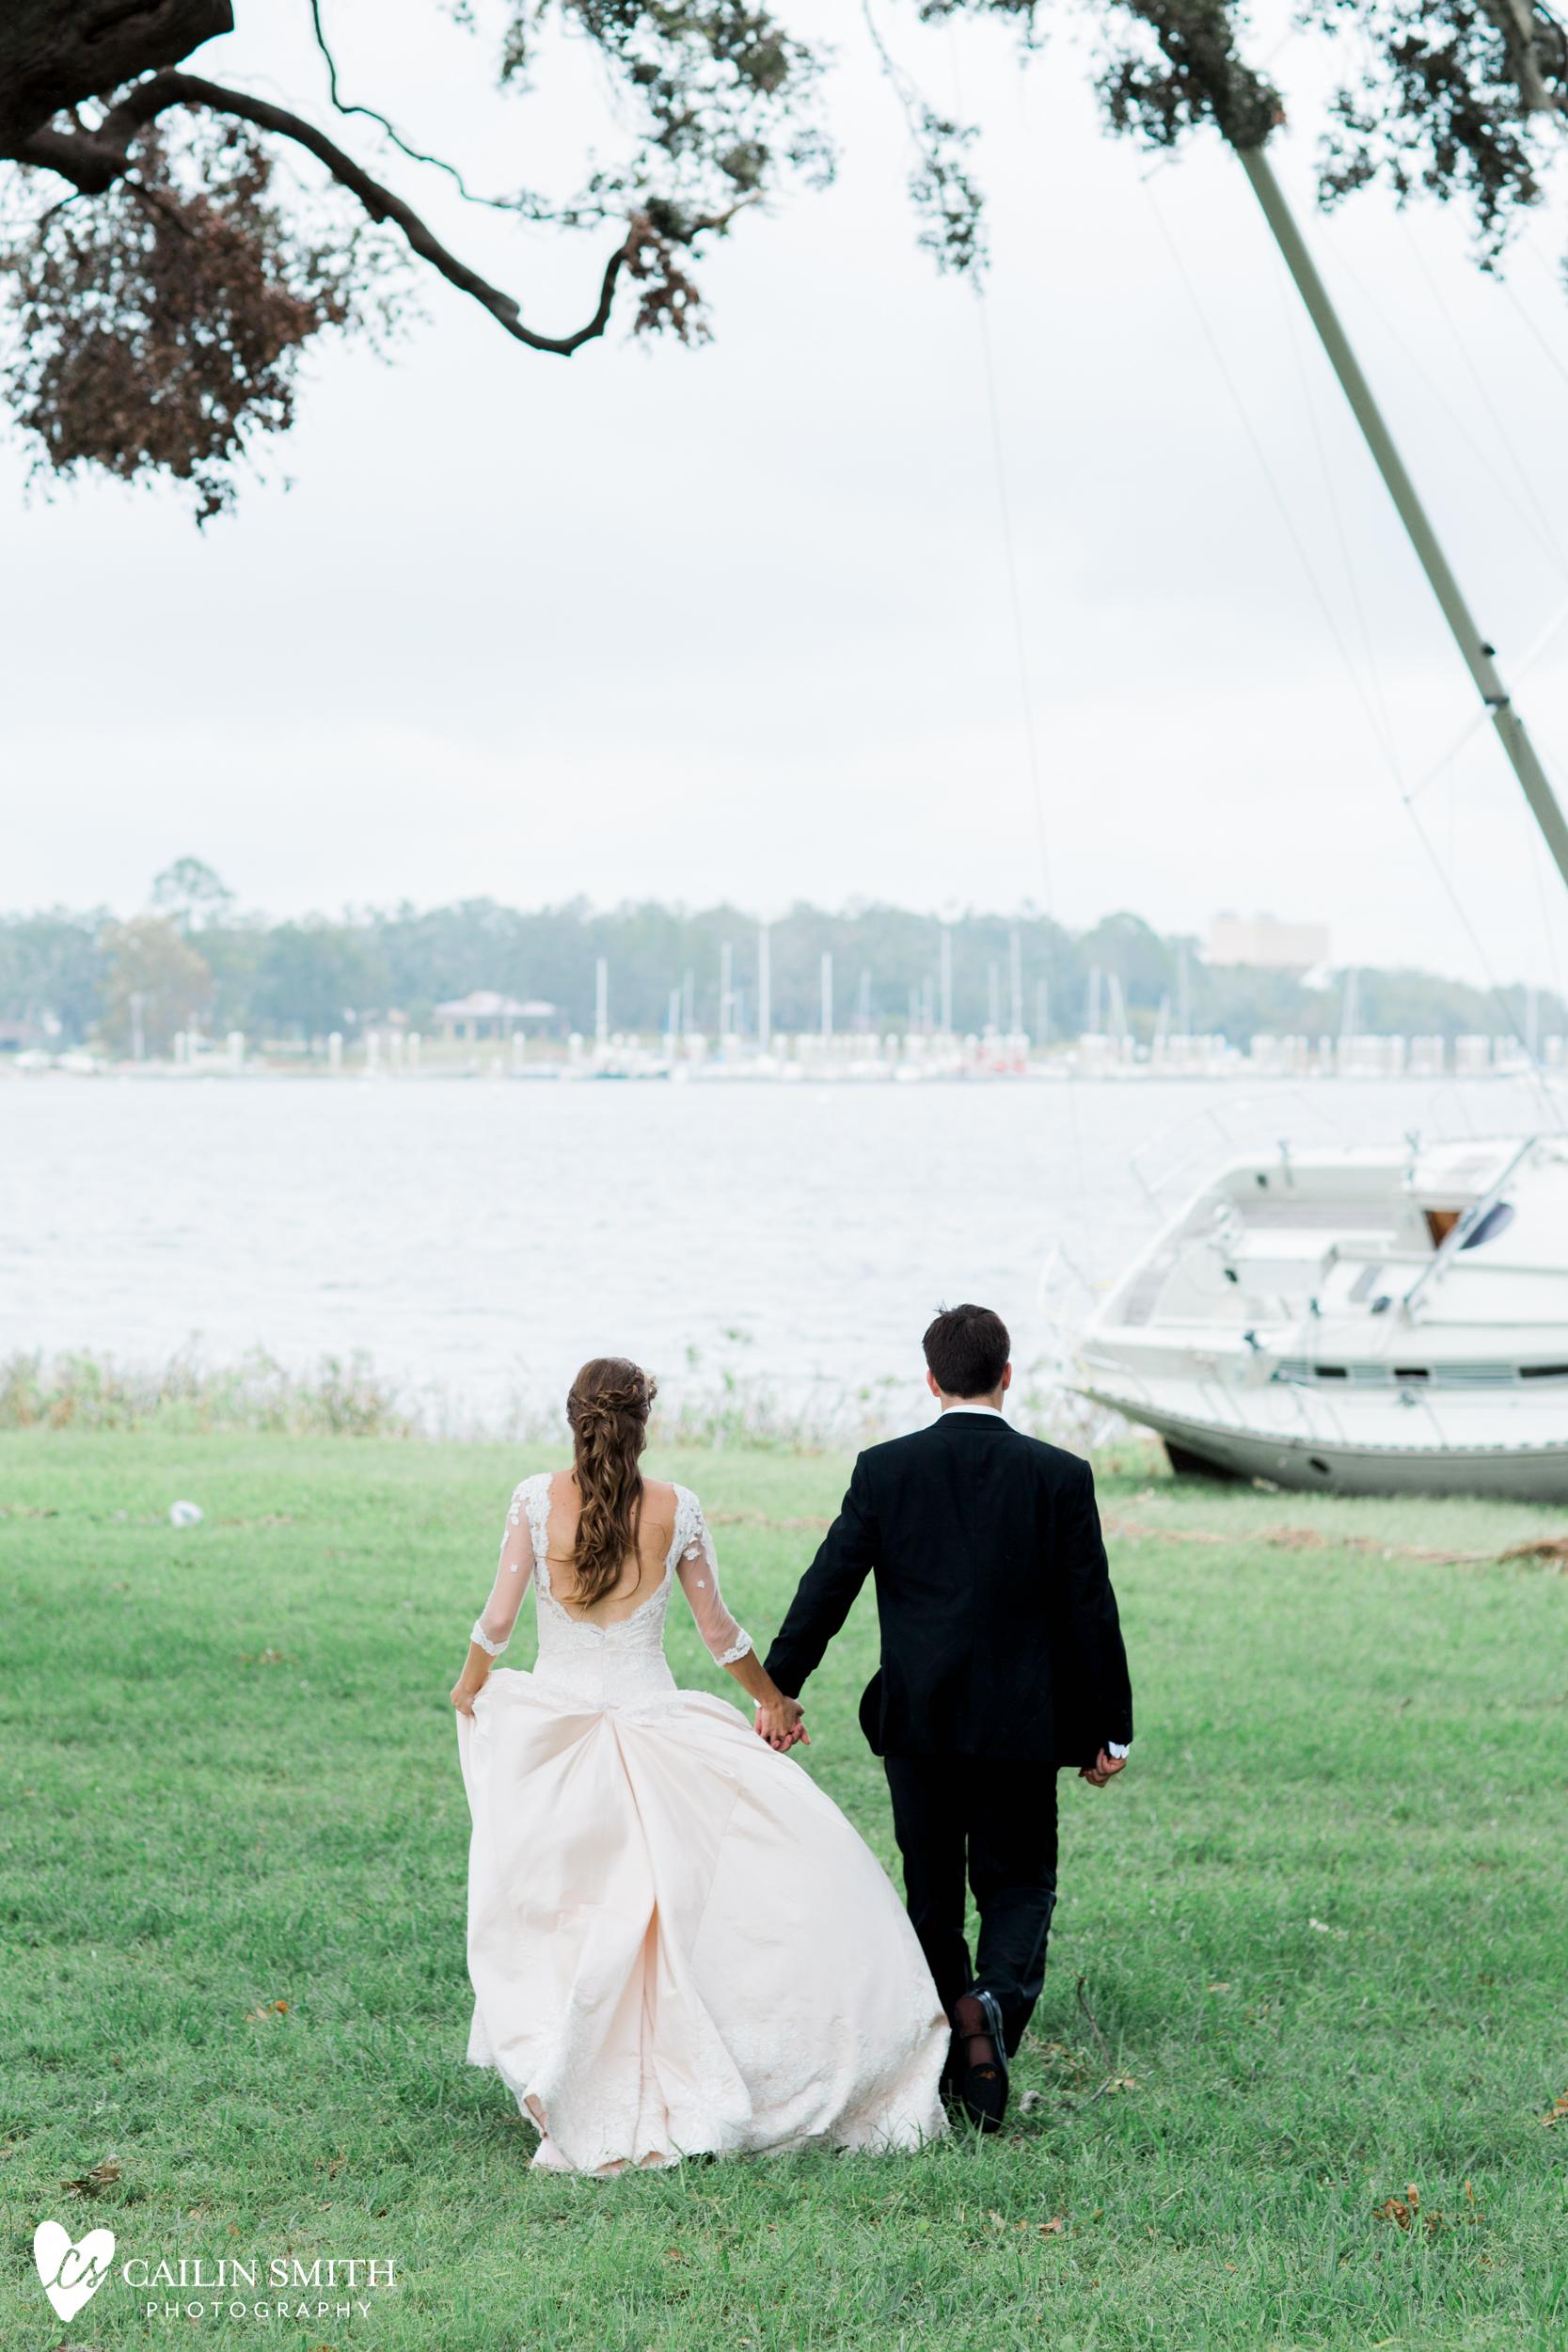 Shannon_David_Grace_Episcopal_Church_Wedding_photography_009.jpg